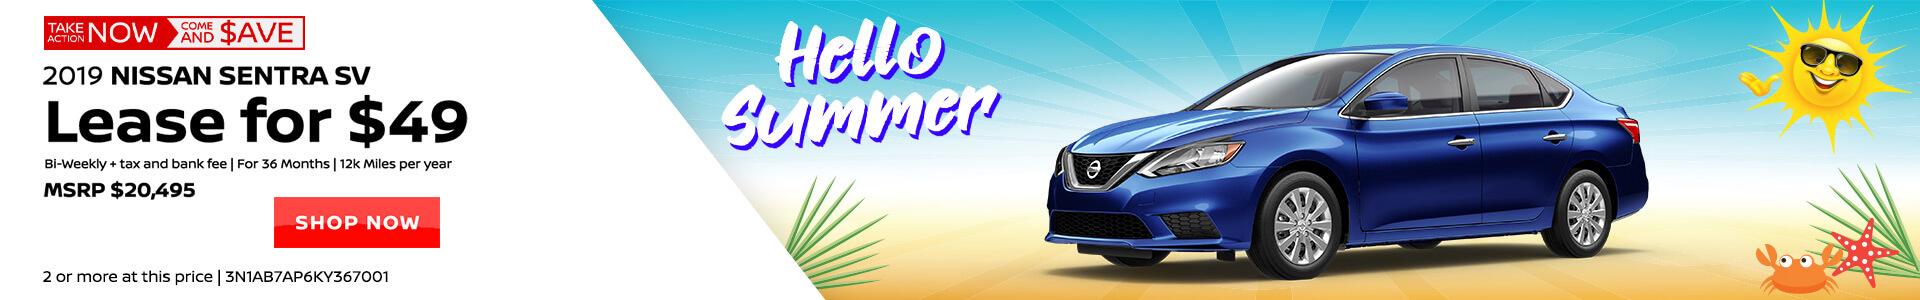 Nissan Sentra $98 Lease